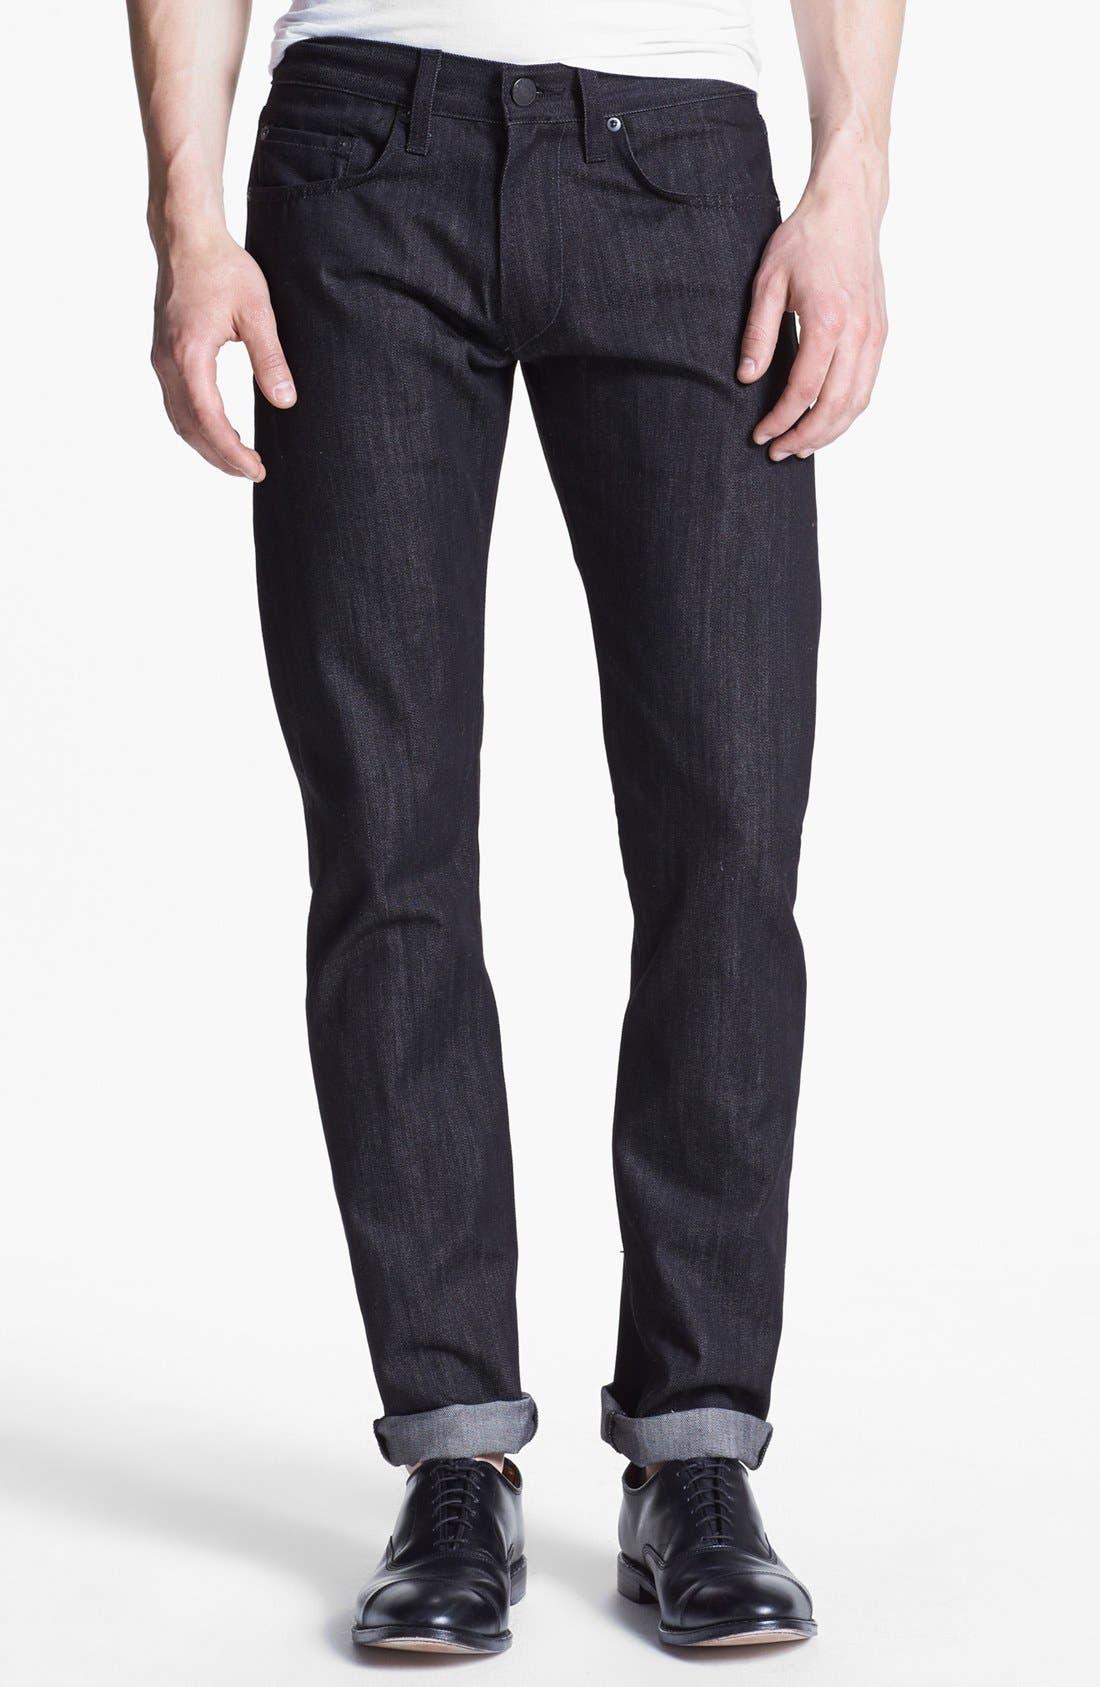 Alternate Image 1 Selected - J Brand 'Tyler' Slim Fit Jeans (Black Raw)